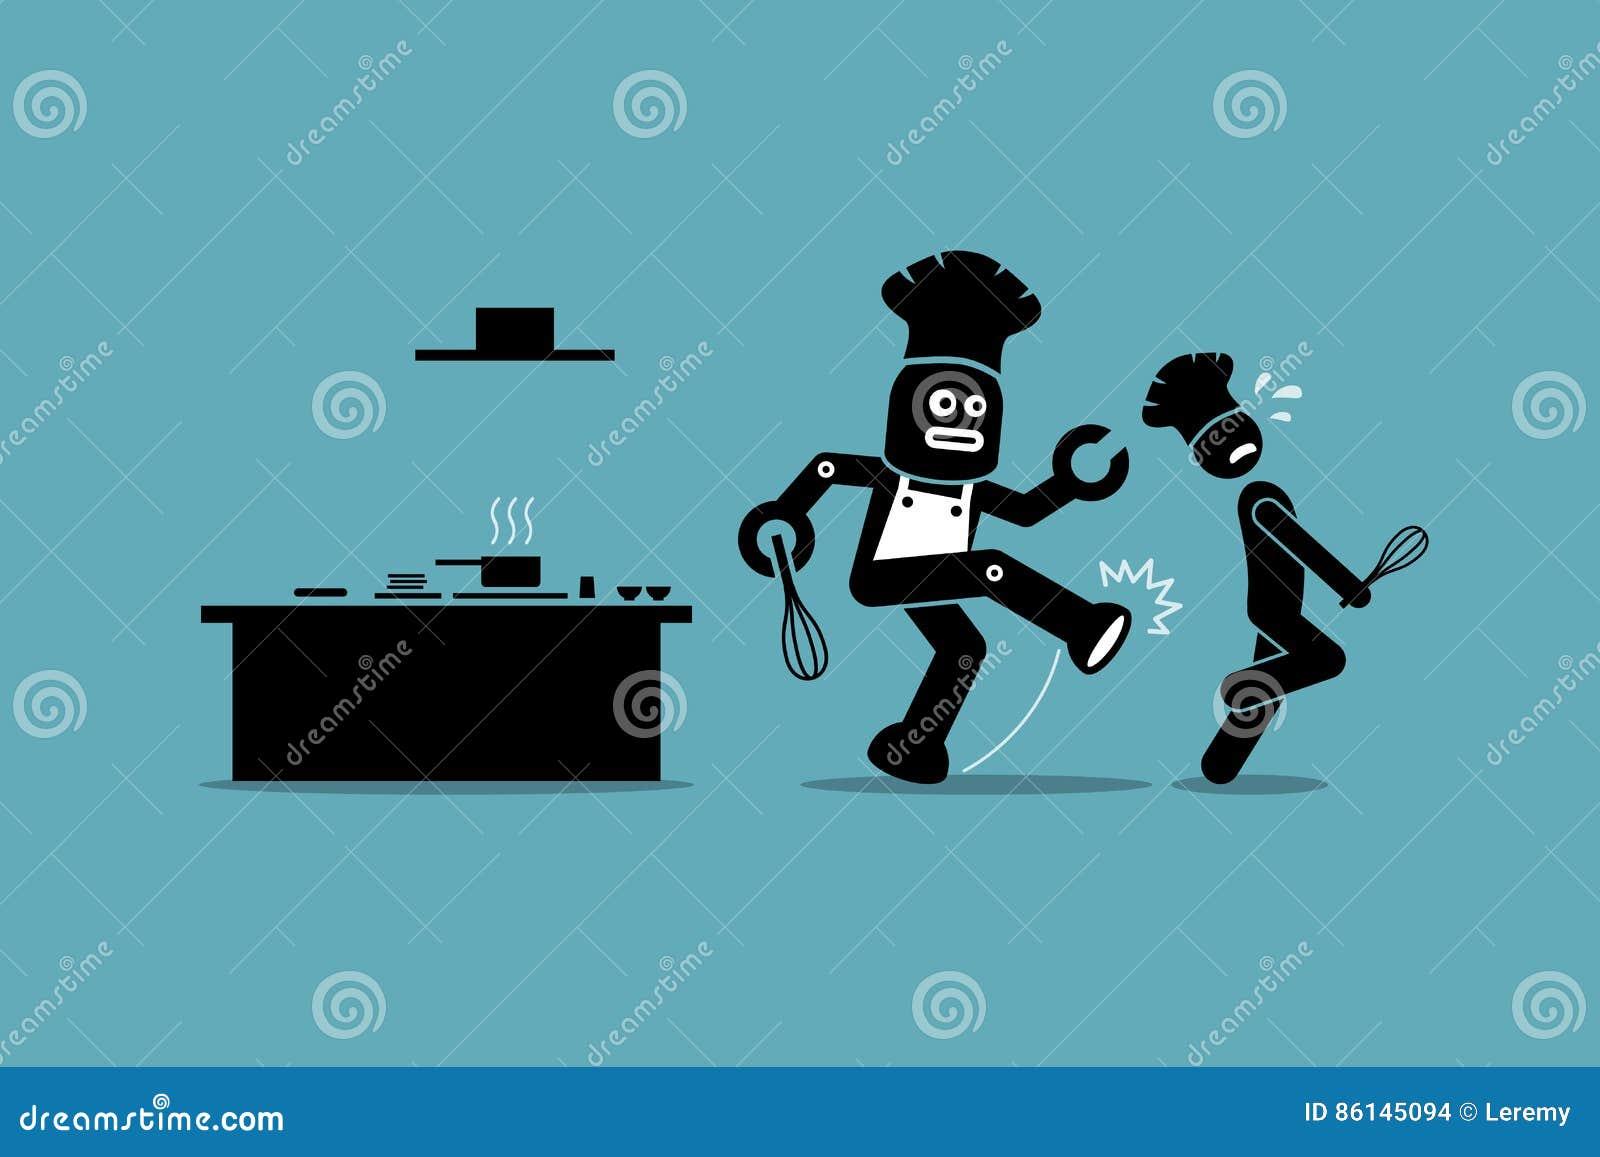 Robot Chef Kicks Away A Human Chef From Doing His Job At Kitchen ...